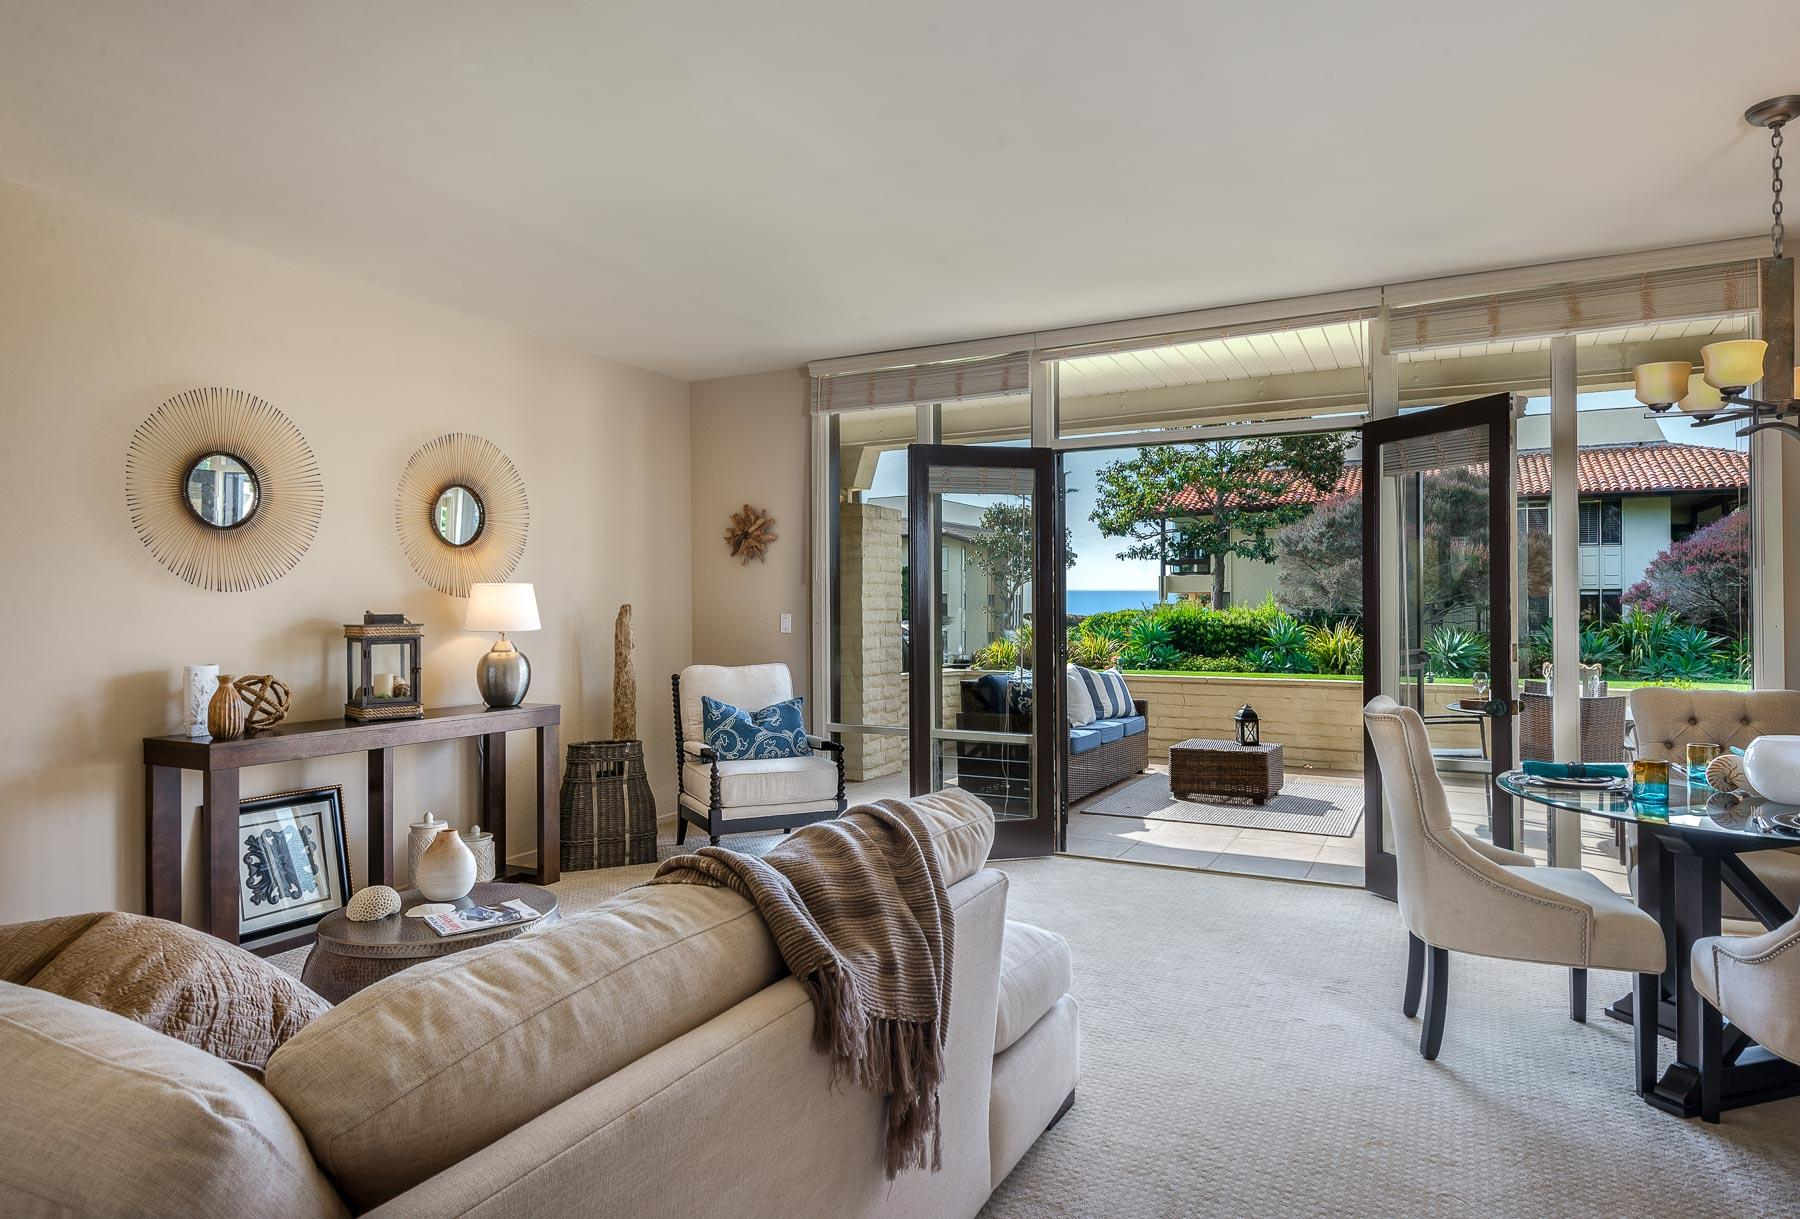 Property photo for 1308 Plaza Pacifica Santa Barbara, California 93108 - 15-844